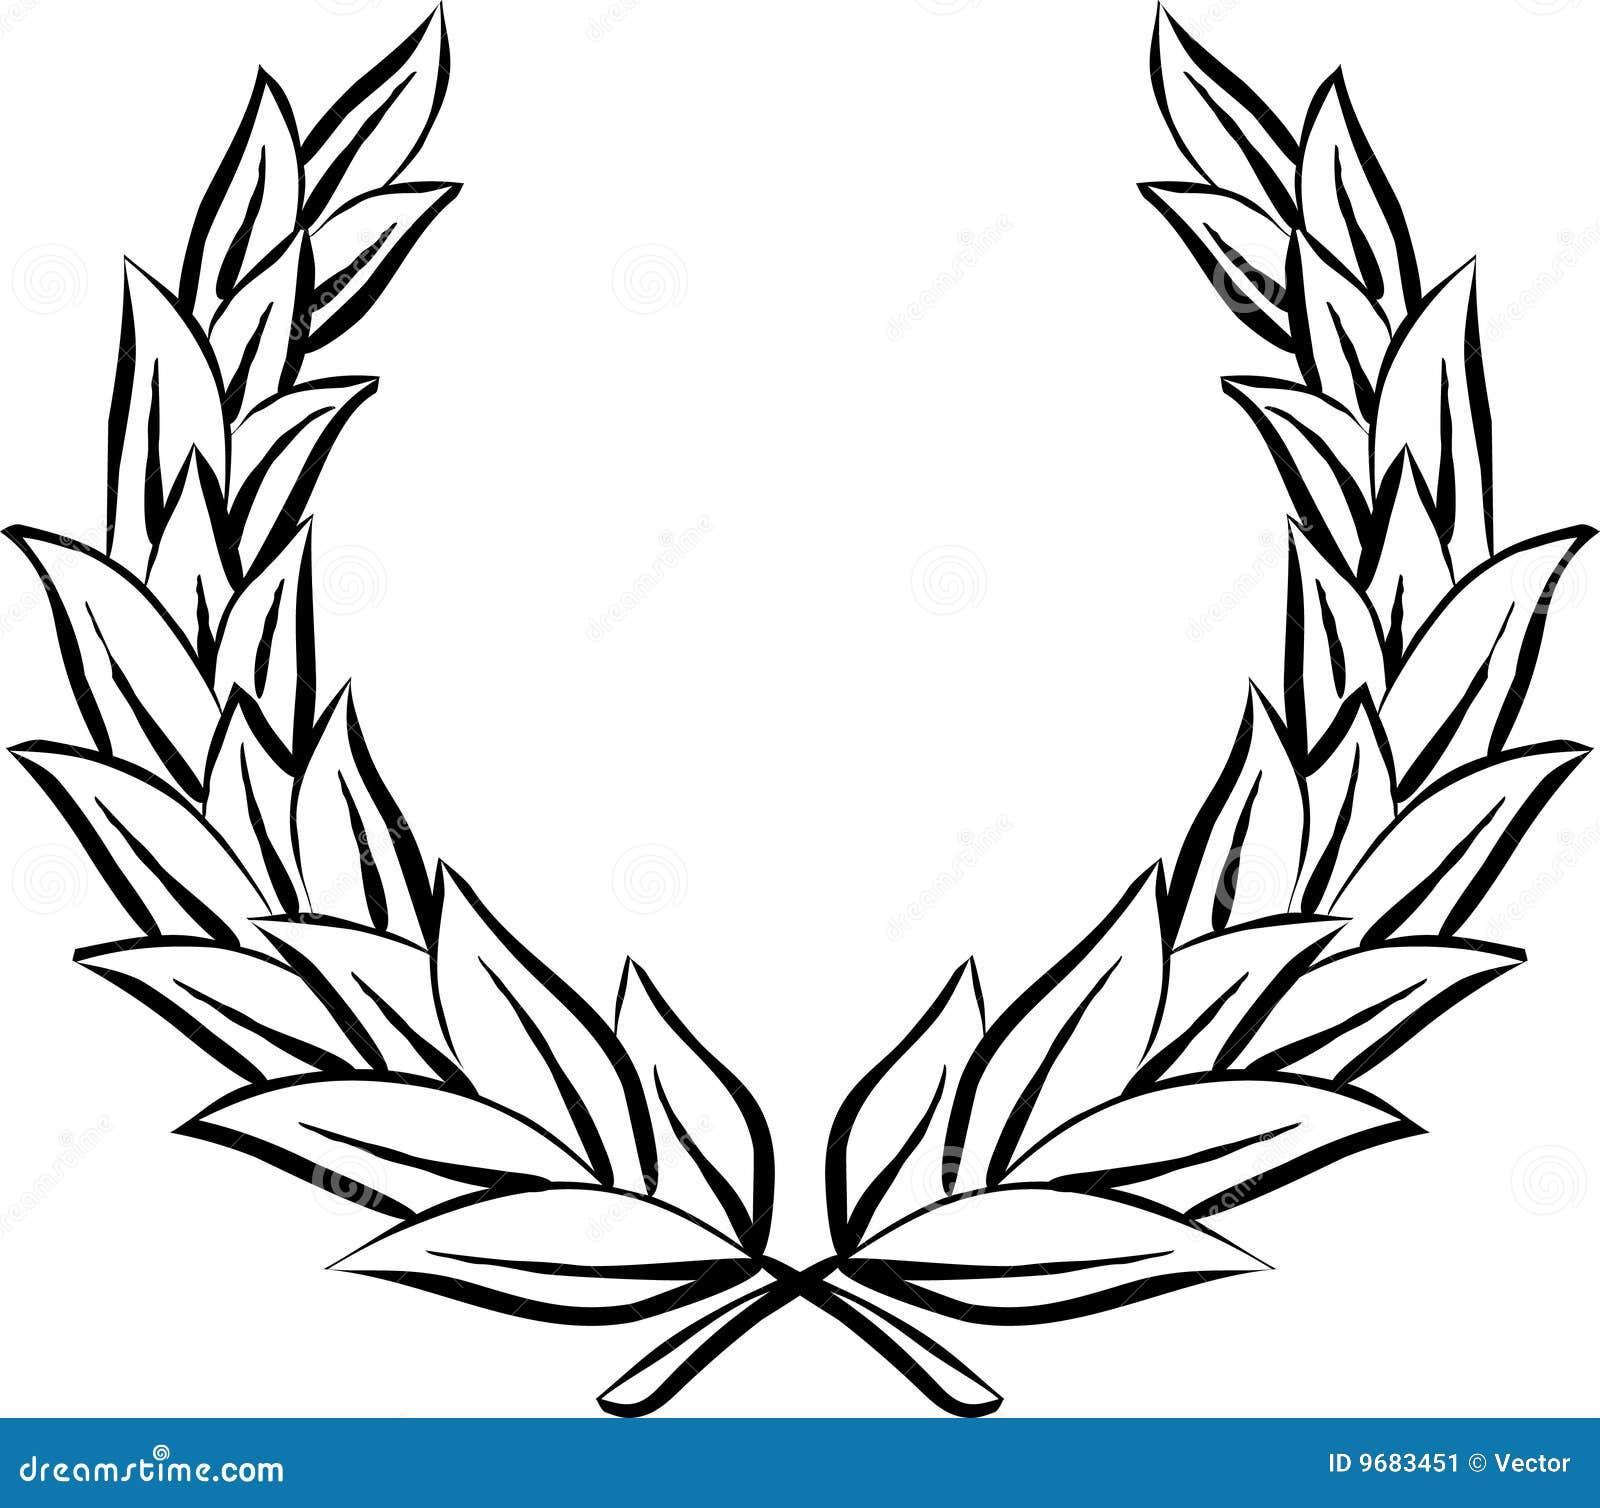 Vector illustration isolated on white background - Laurel wreath.